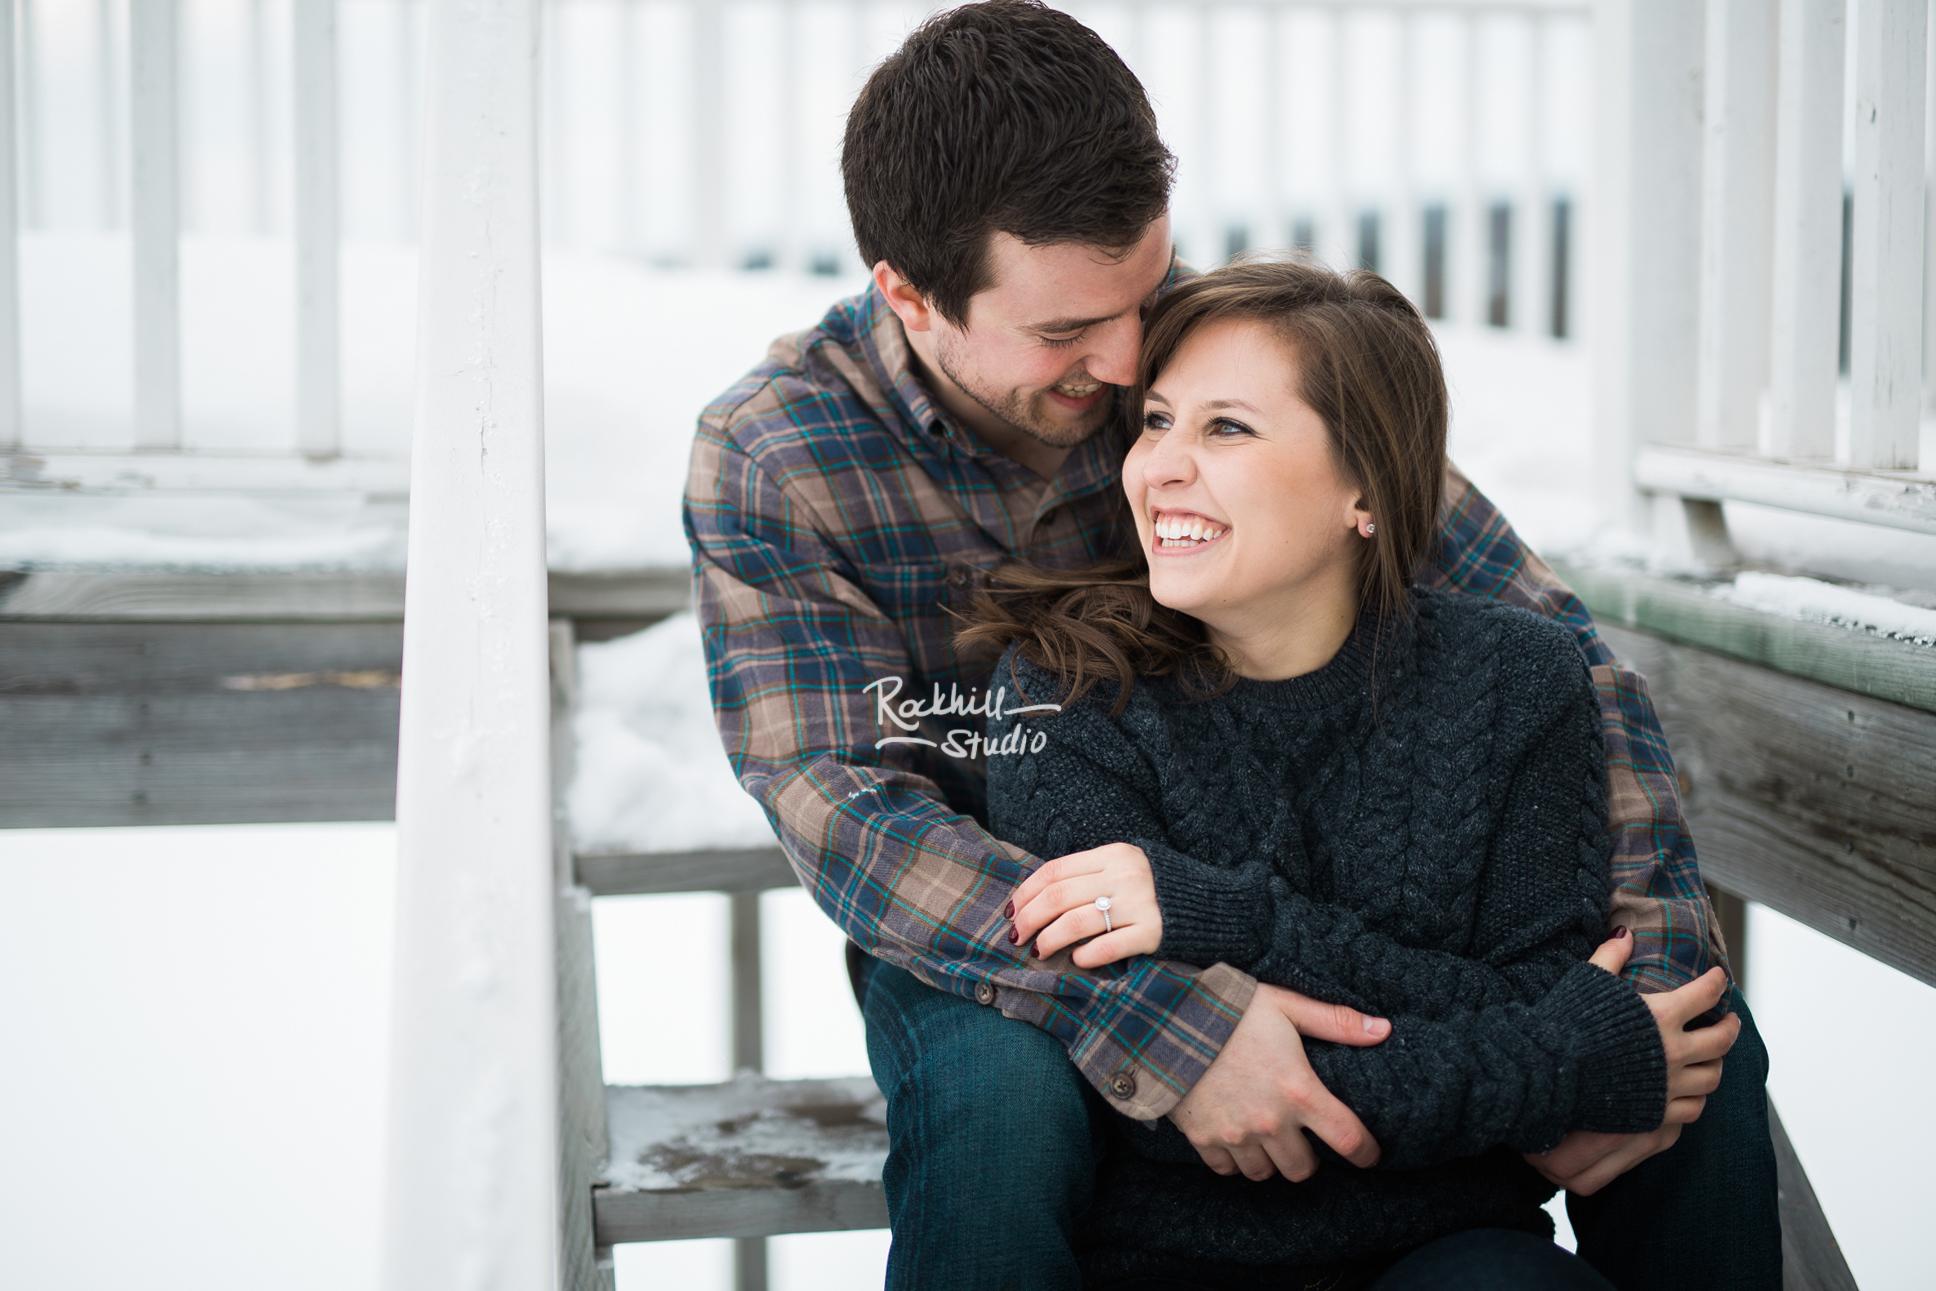 northern-michigan-upper-peninsula-engagement-photography-wedding-rockhill-studio-marquette-6.jpg